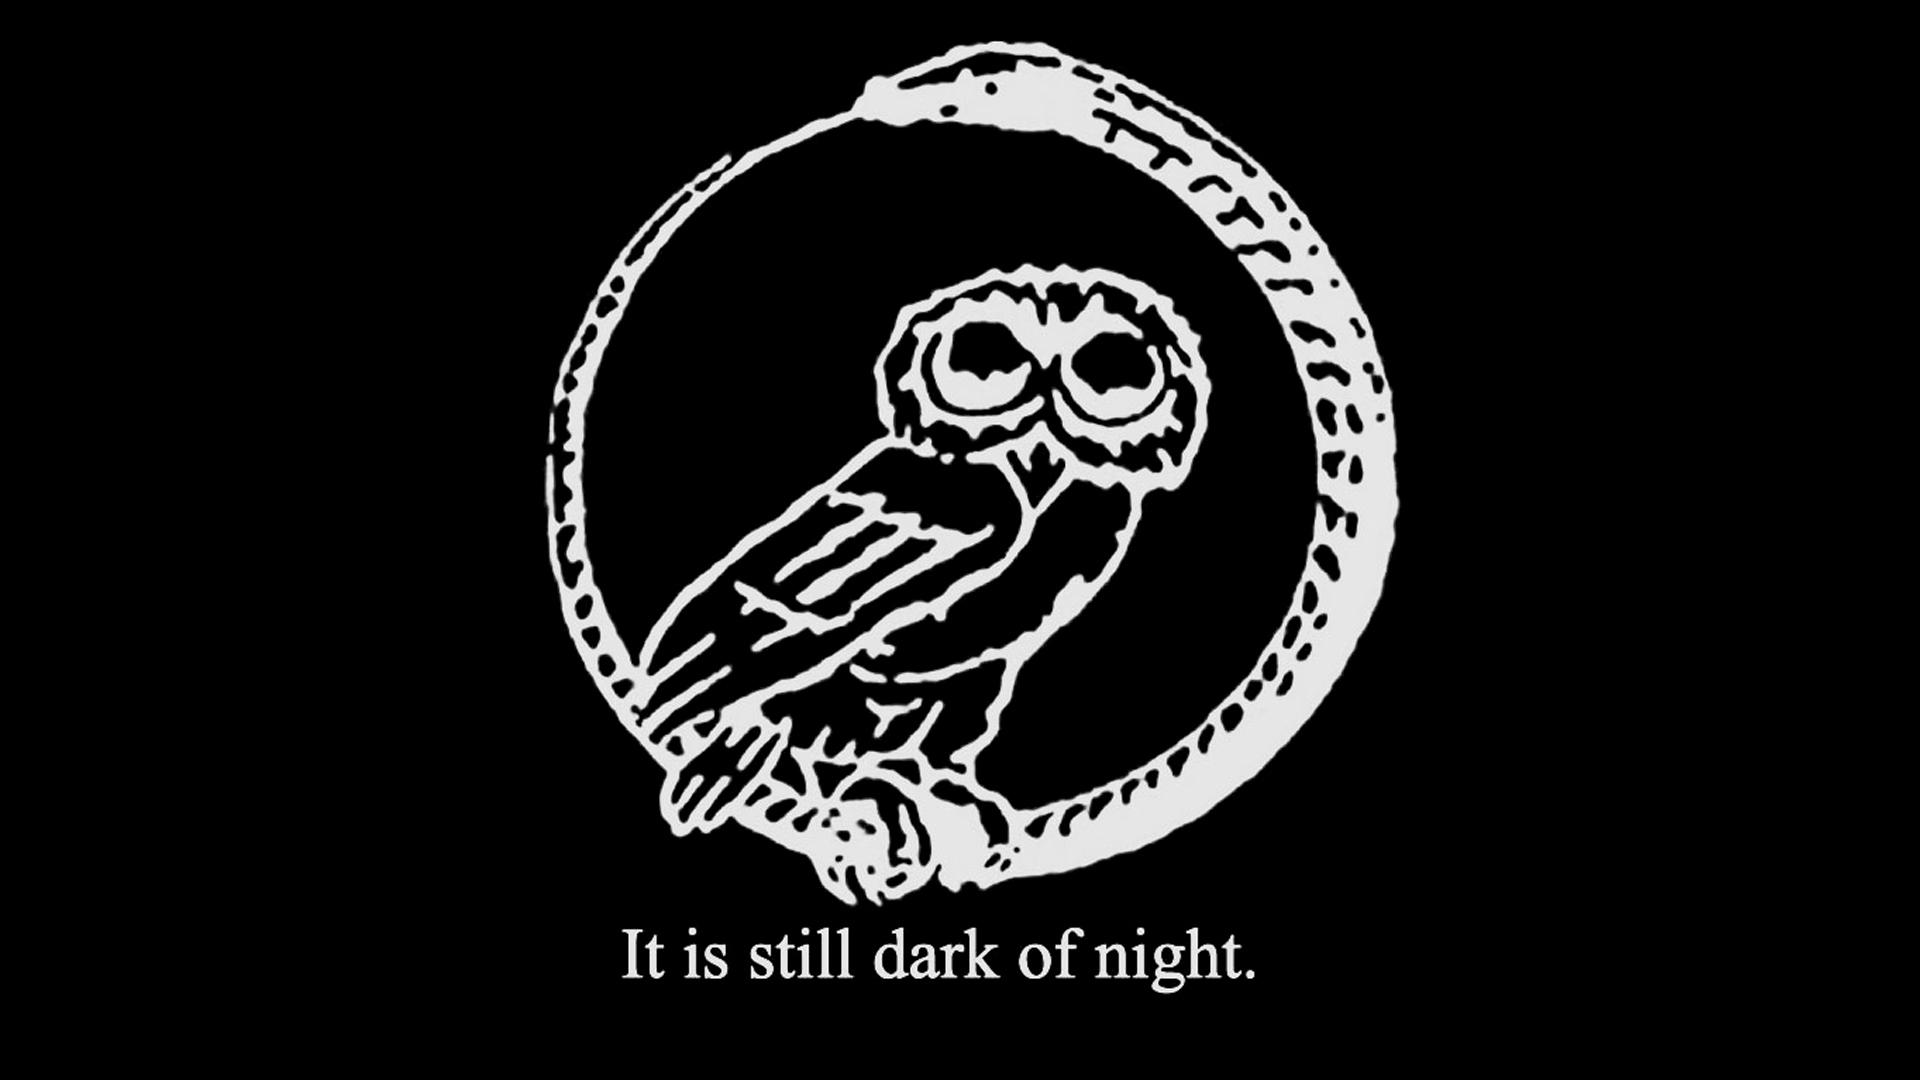 Amazing Wallpaper Home Screen Owl - dark_of_night_ouro  HD_655838.jpg